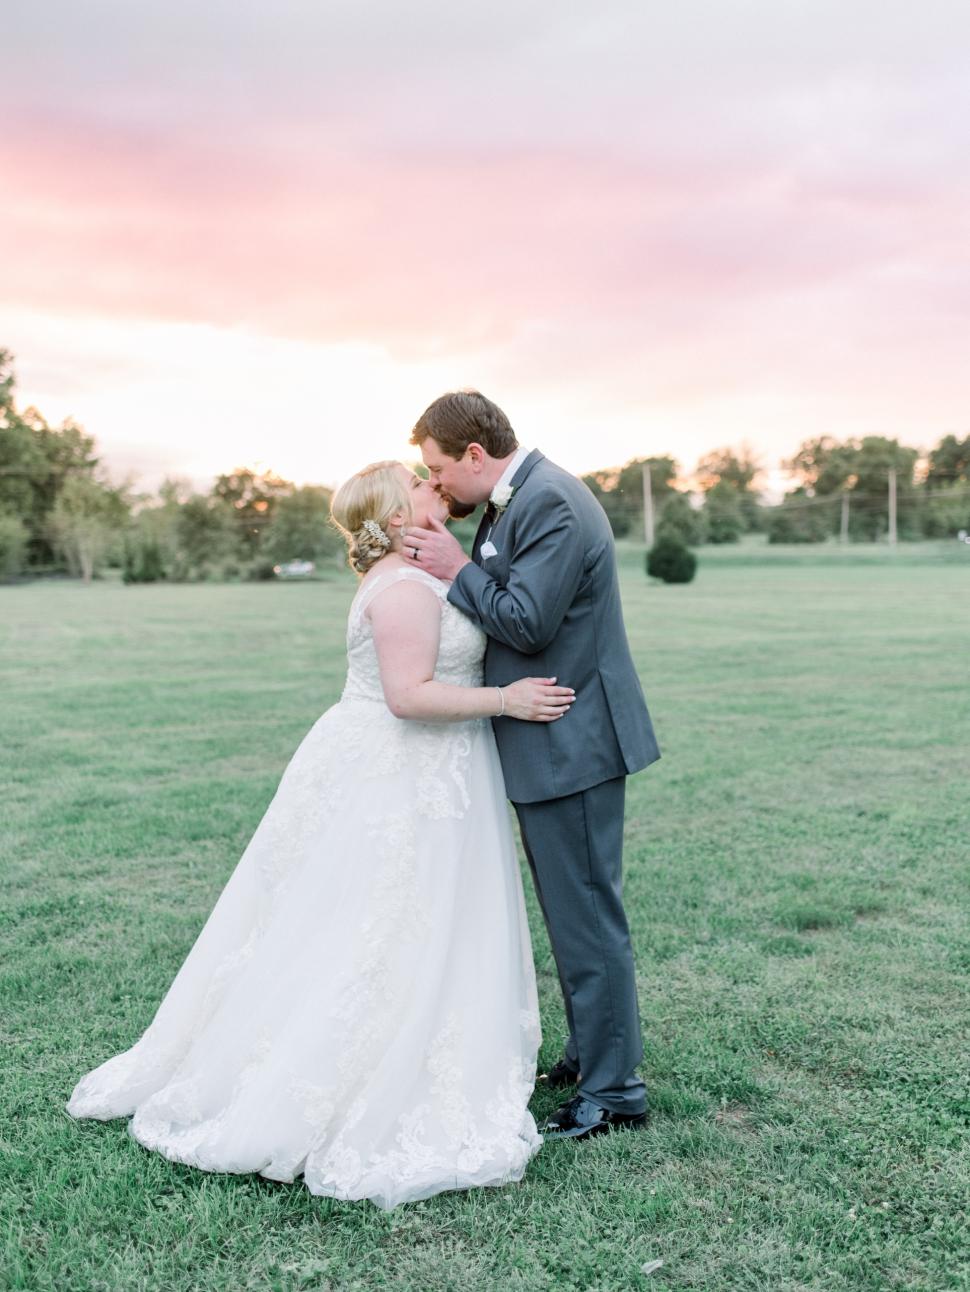 Pennsylvania-Wedding-Photographer-Cassi-Claire-Rosebank-Winery-Wedding_22.jpg